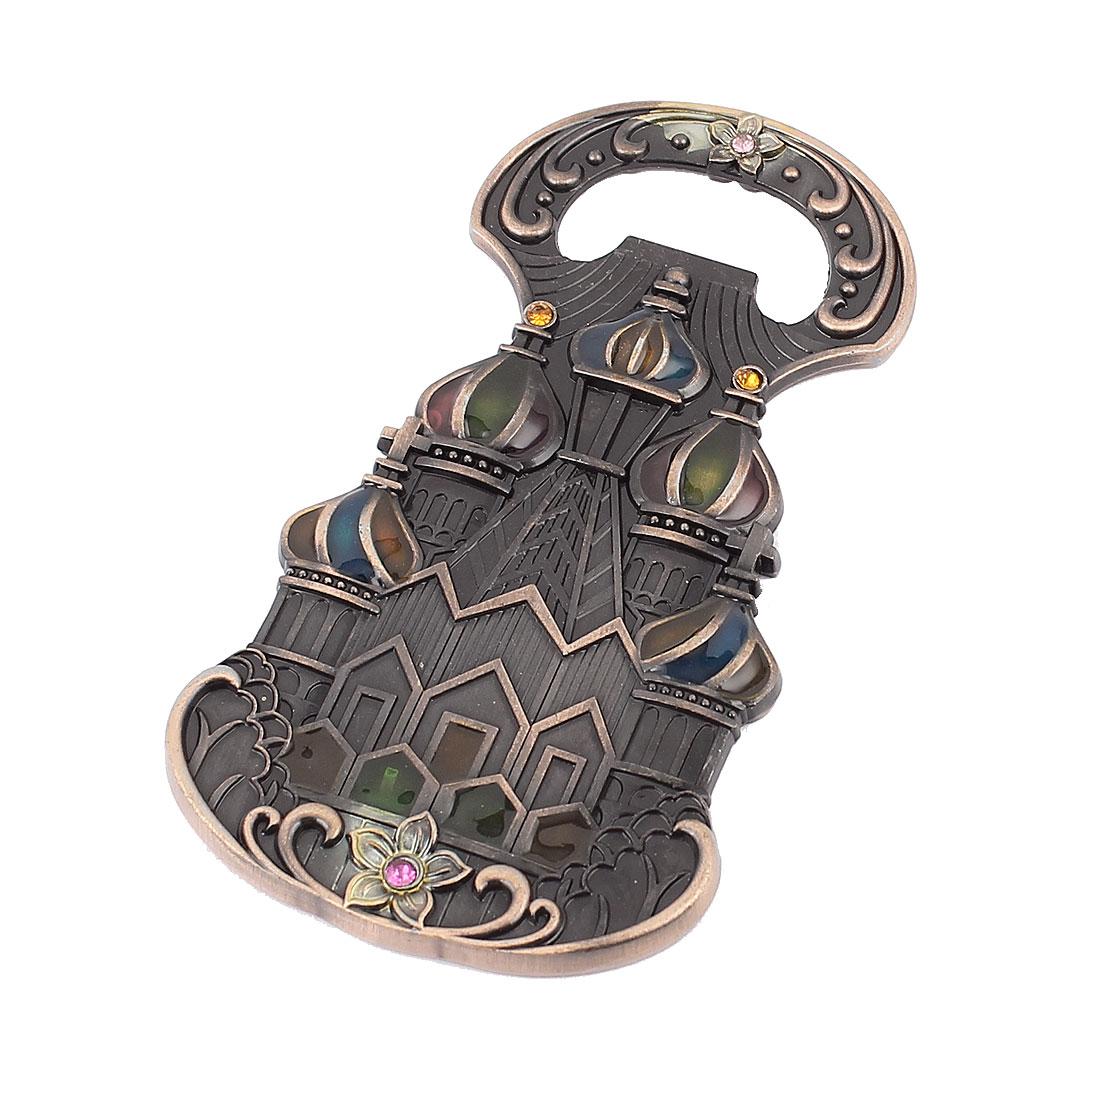 Castle Design Bronze Tone Vintage Style Bottle Opener Magnetic Fridge Sticker